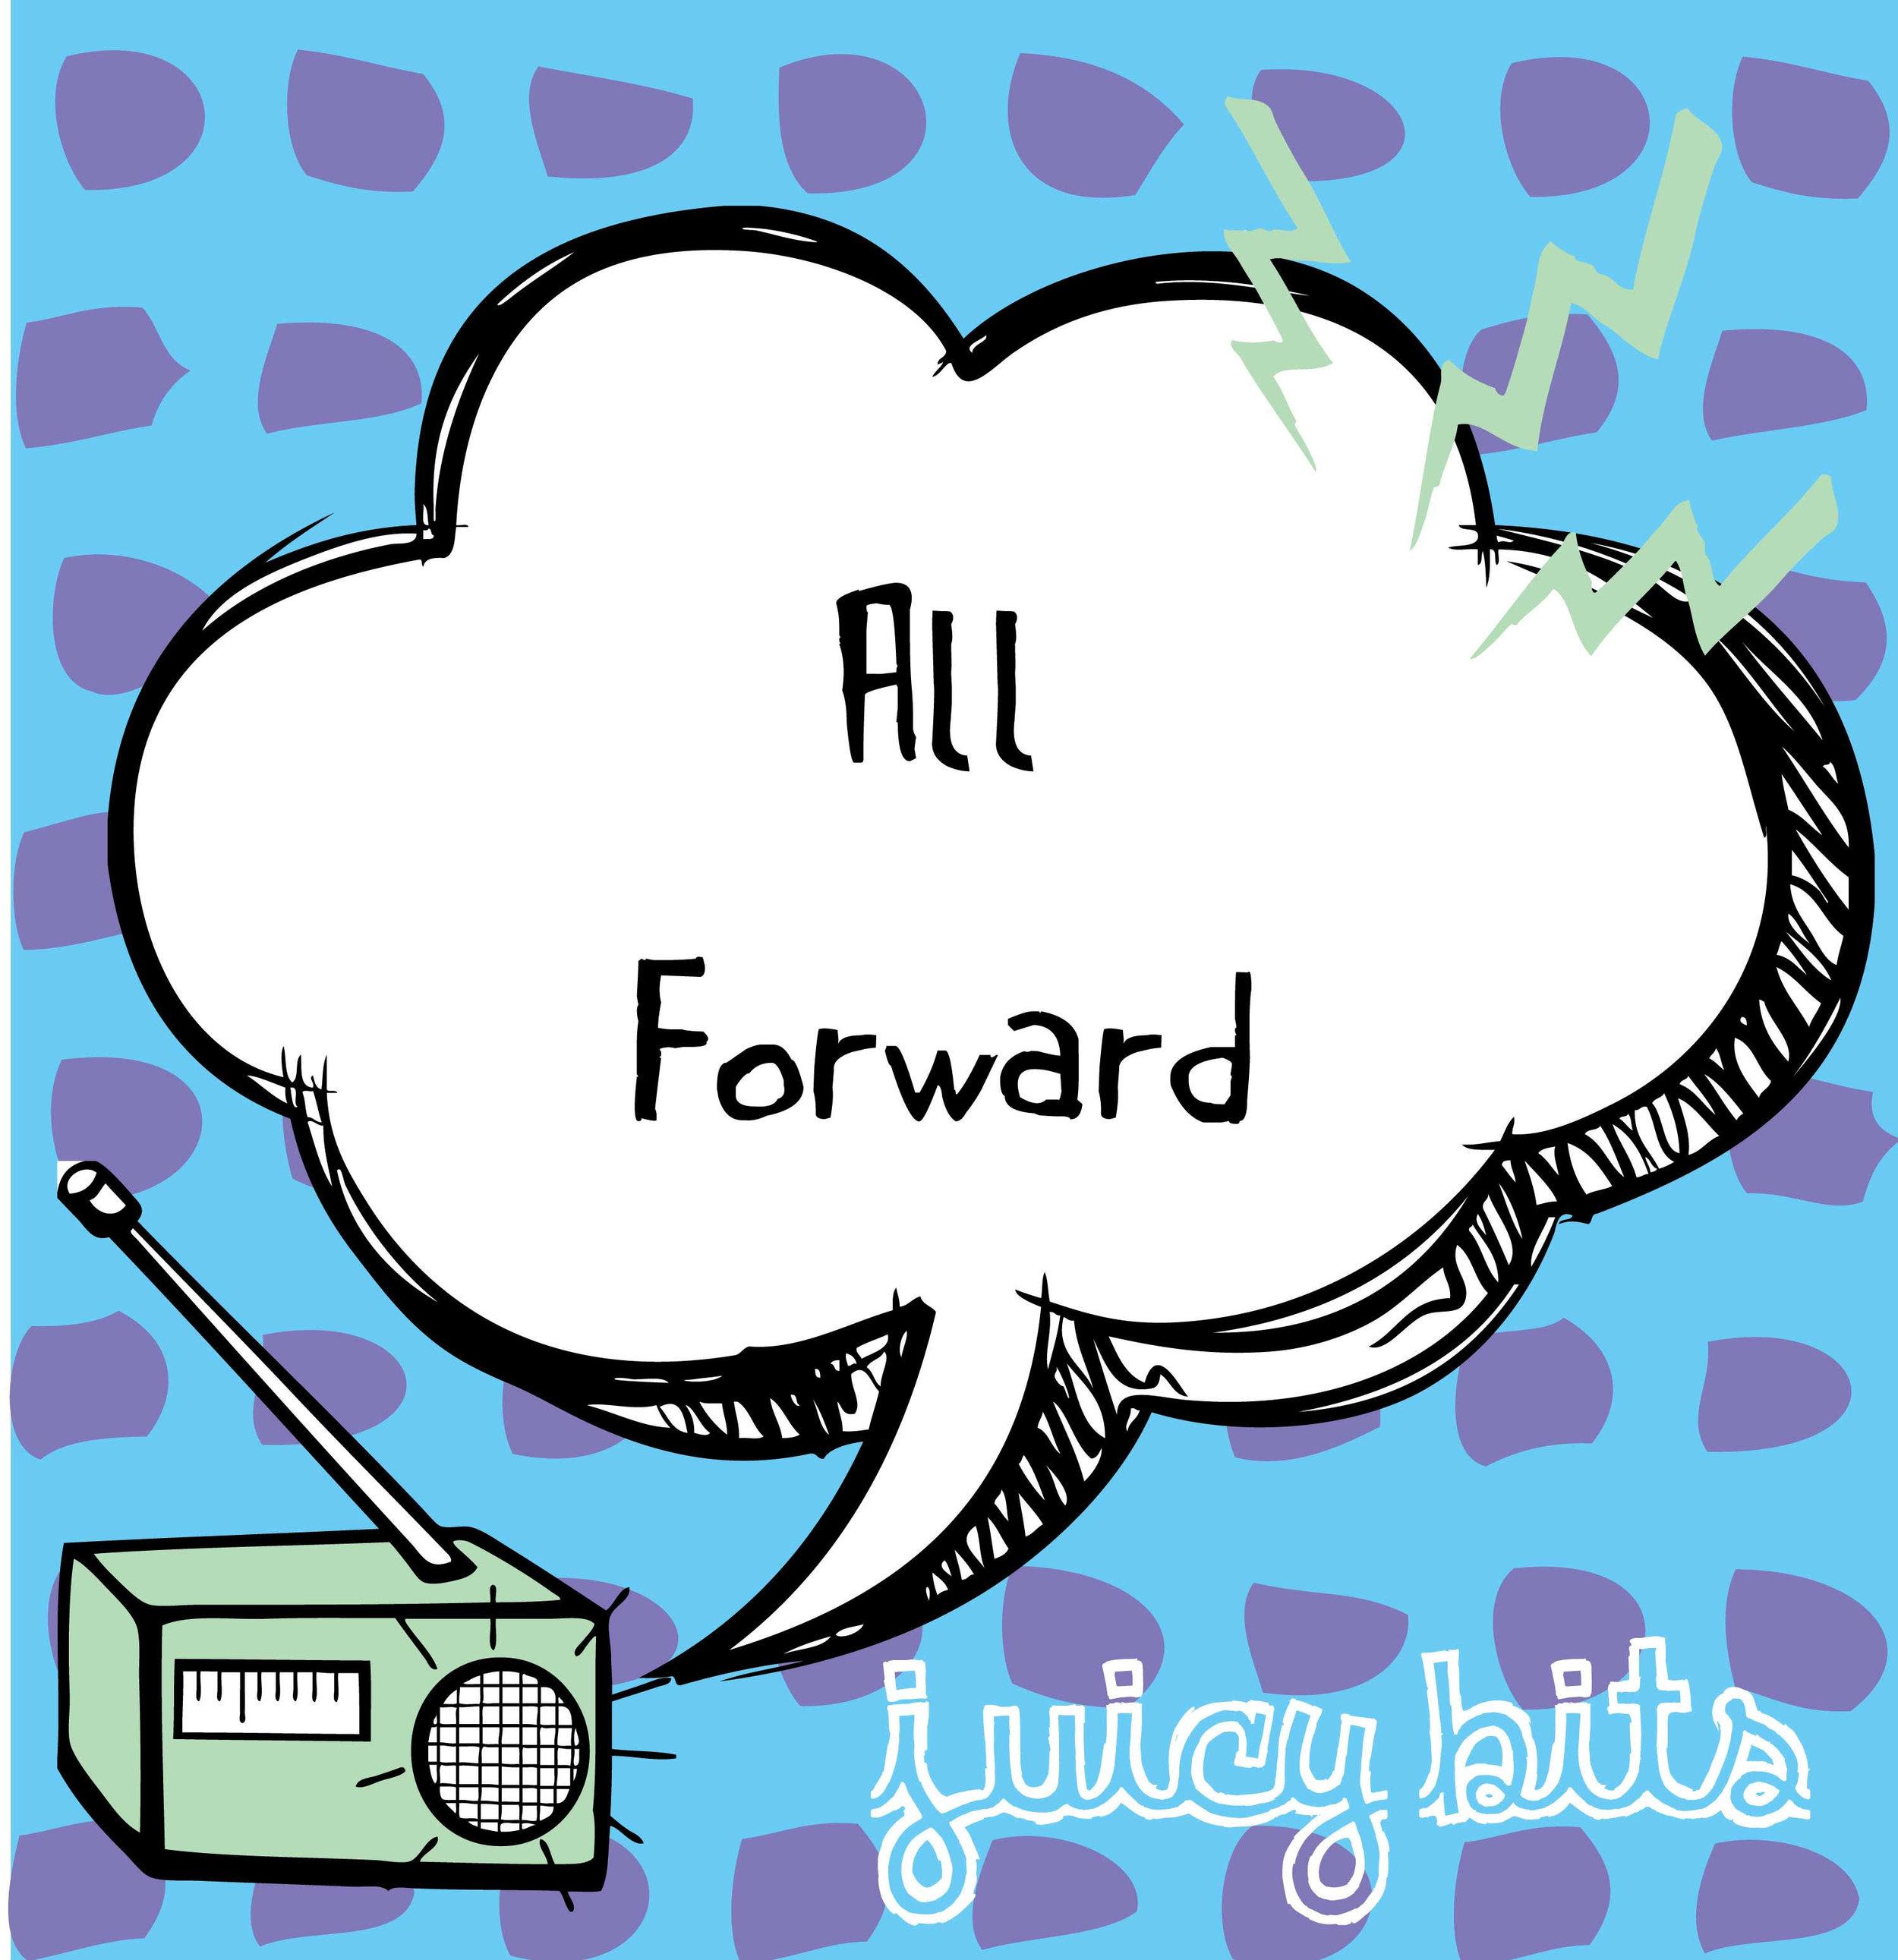 allforward.jpg